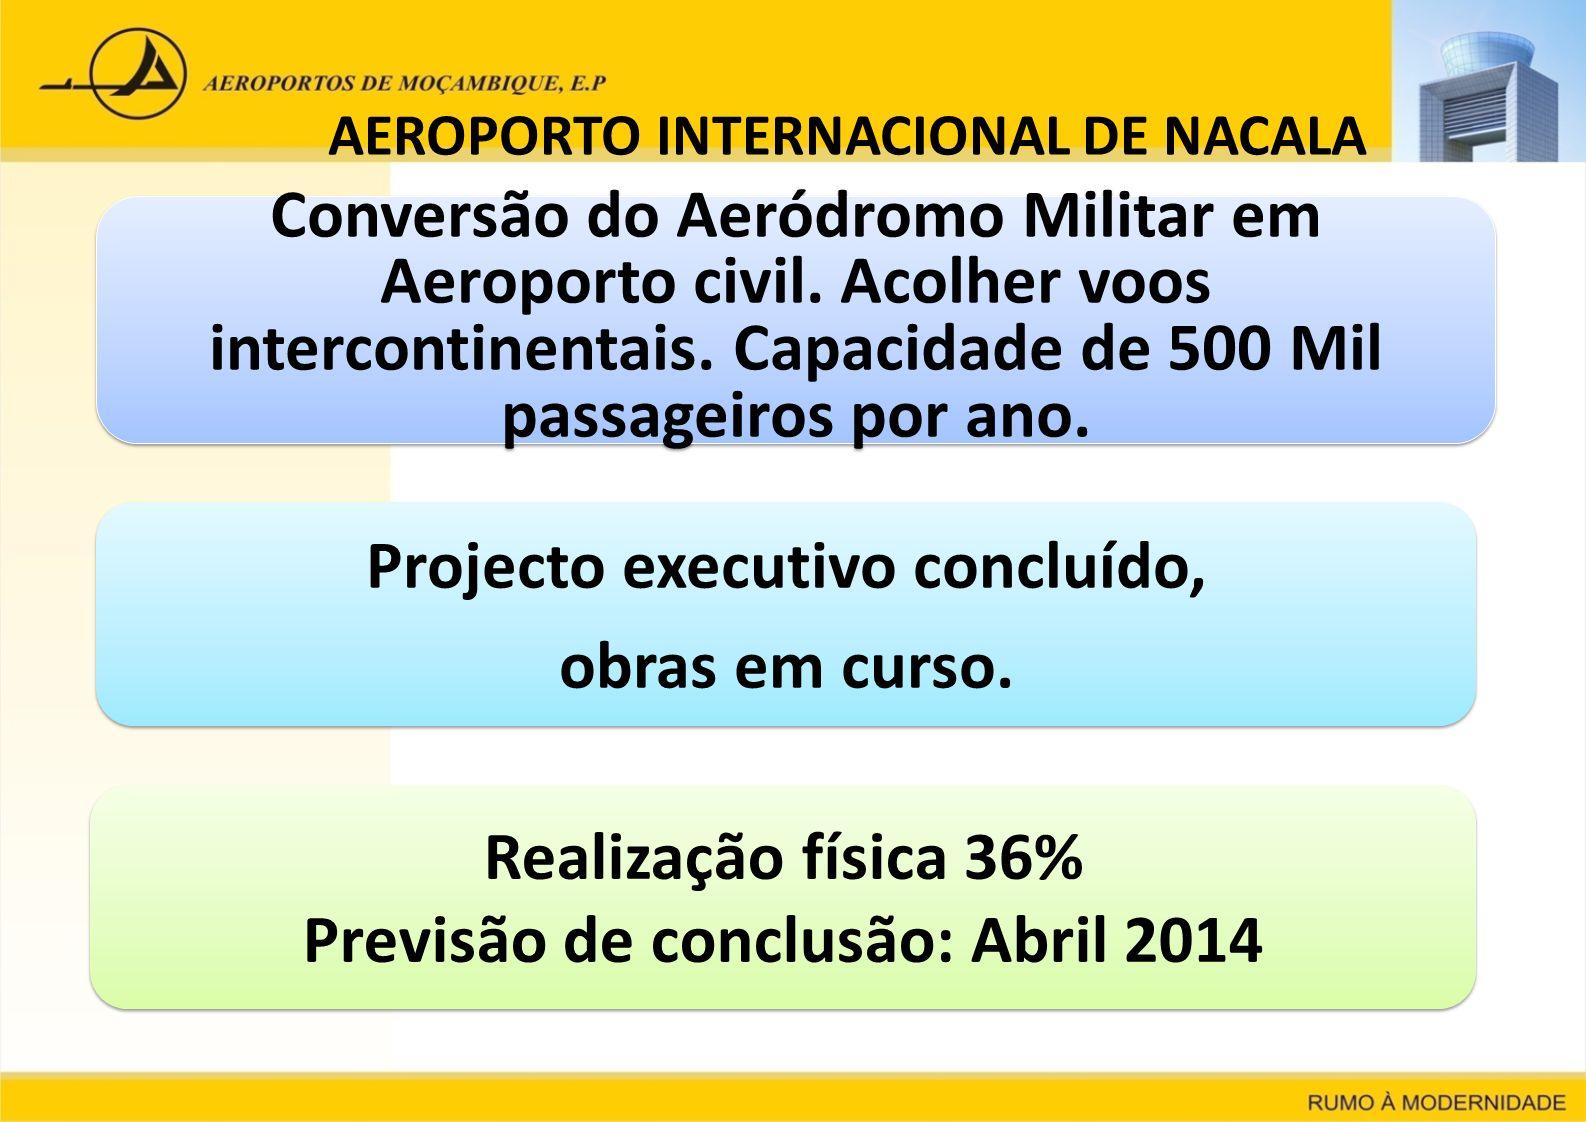 AEROPORTO INTERNACIONAL DE NACALA PRINCIPAIS FRENTES: PISTA: Iniciada última camada (de desgaste) no primeiro troço de 1.800 metros.